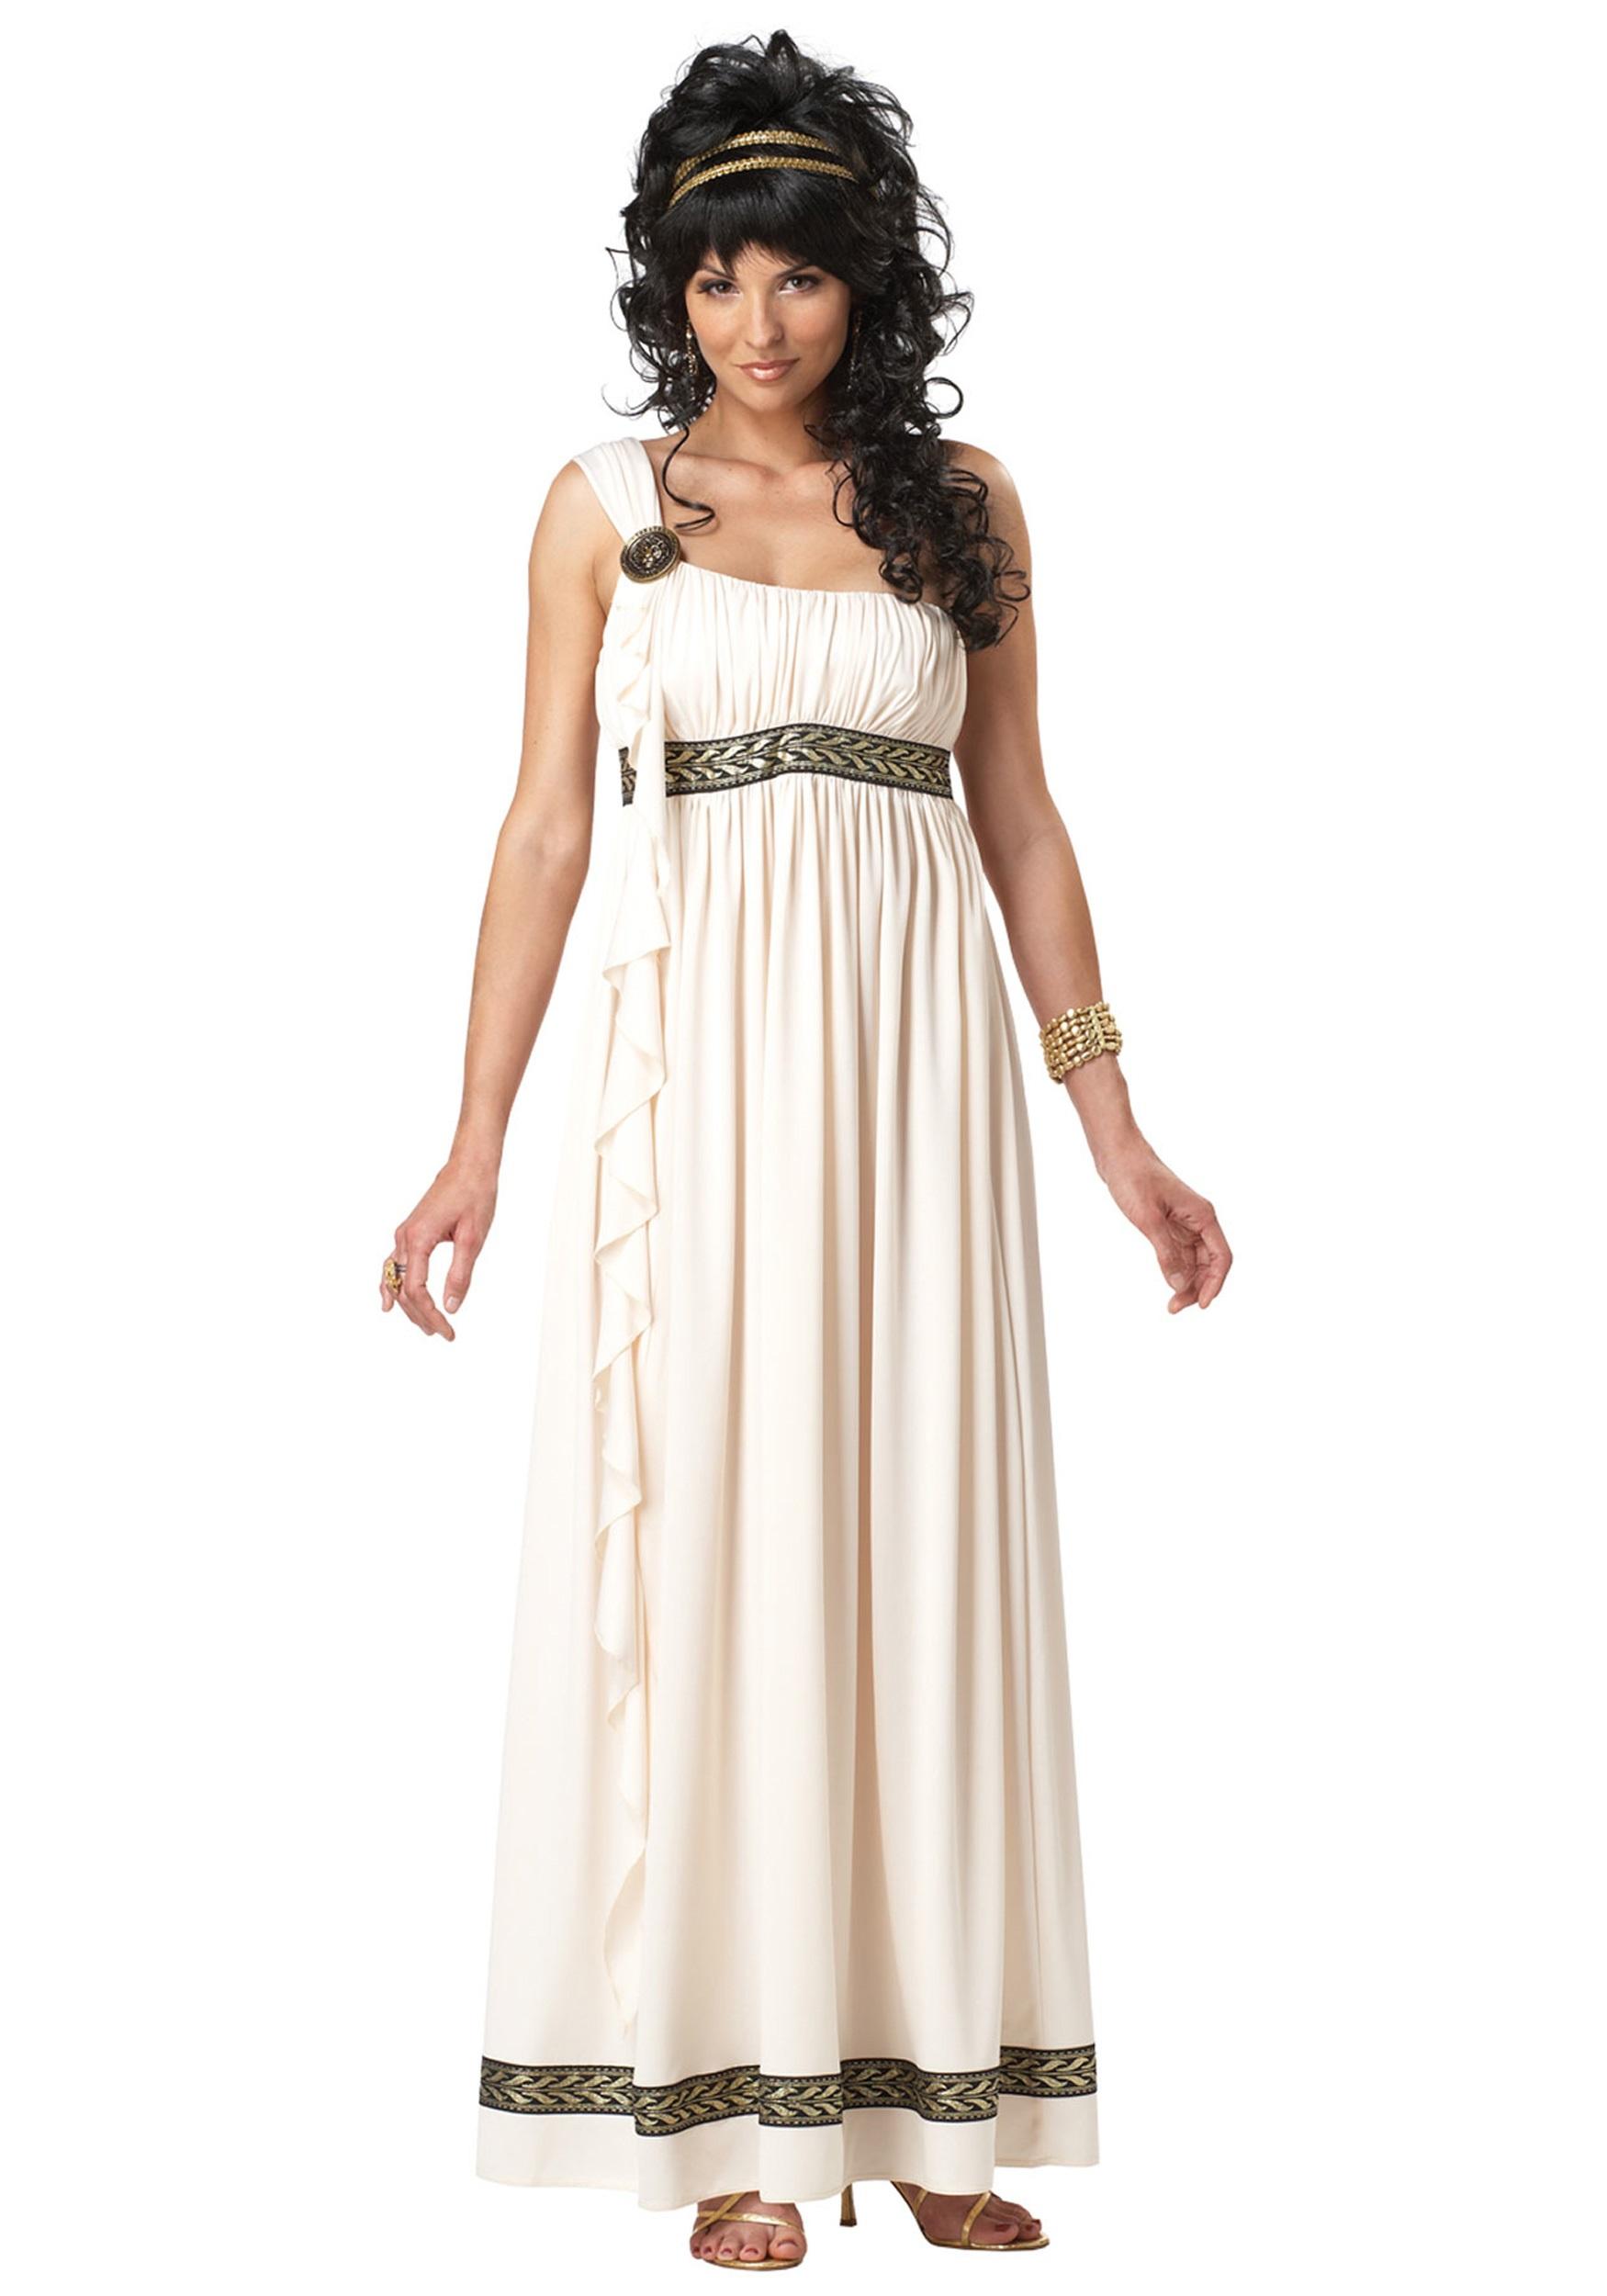 Seasons Greek Goddess Womens 3pc Adult Costume White|Gold